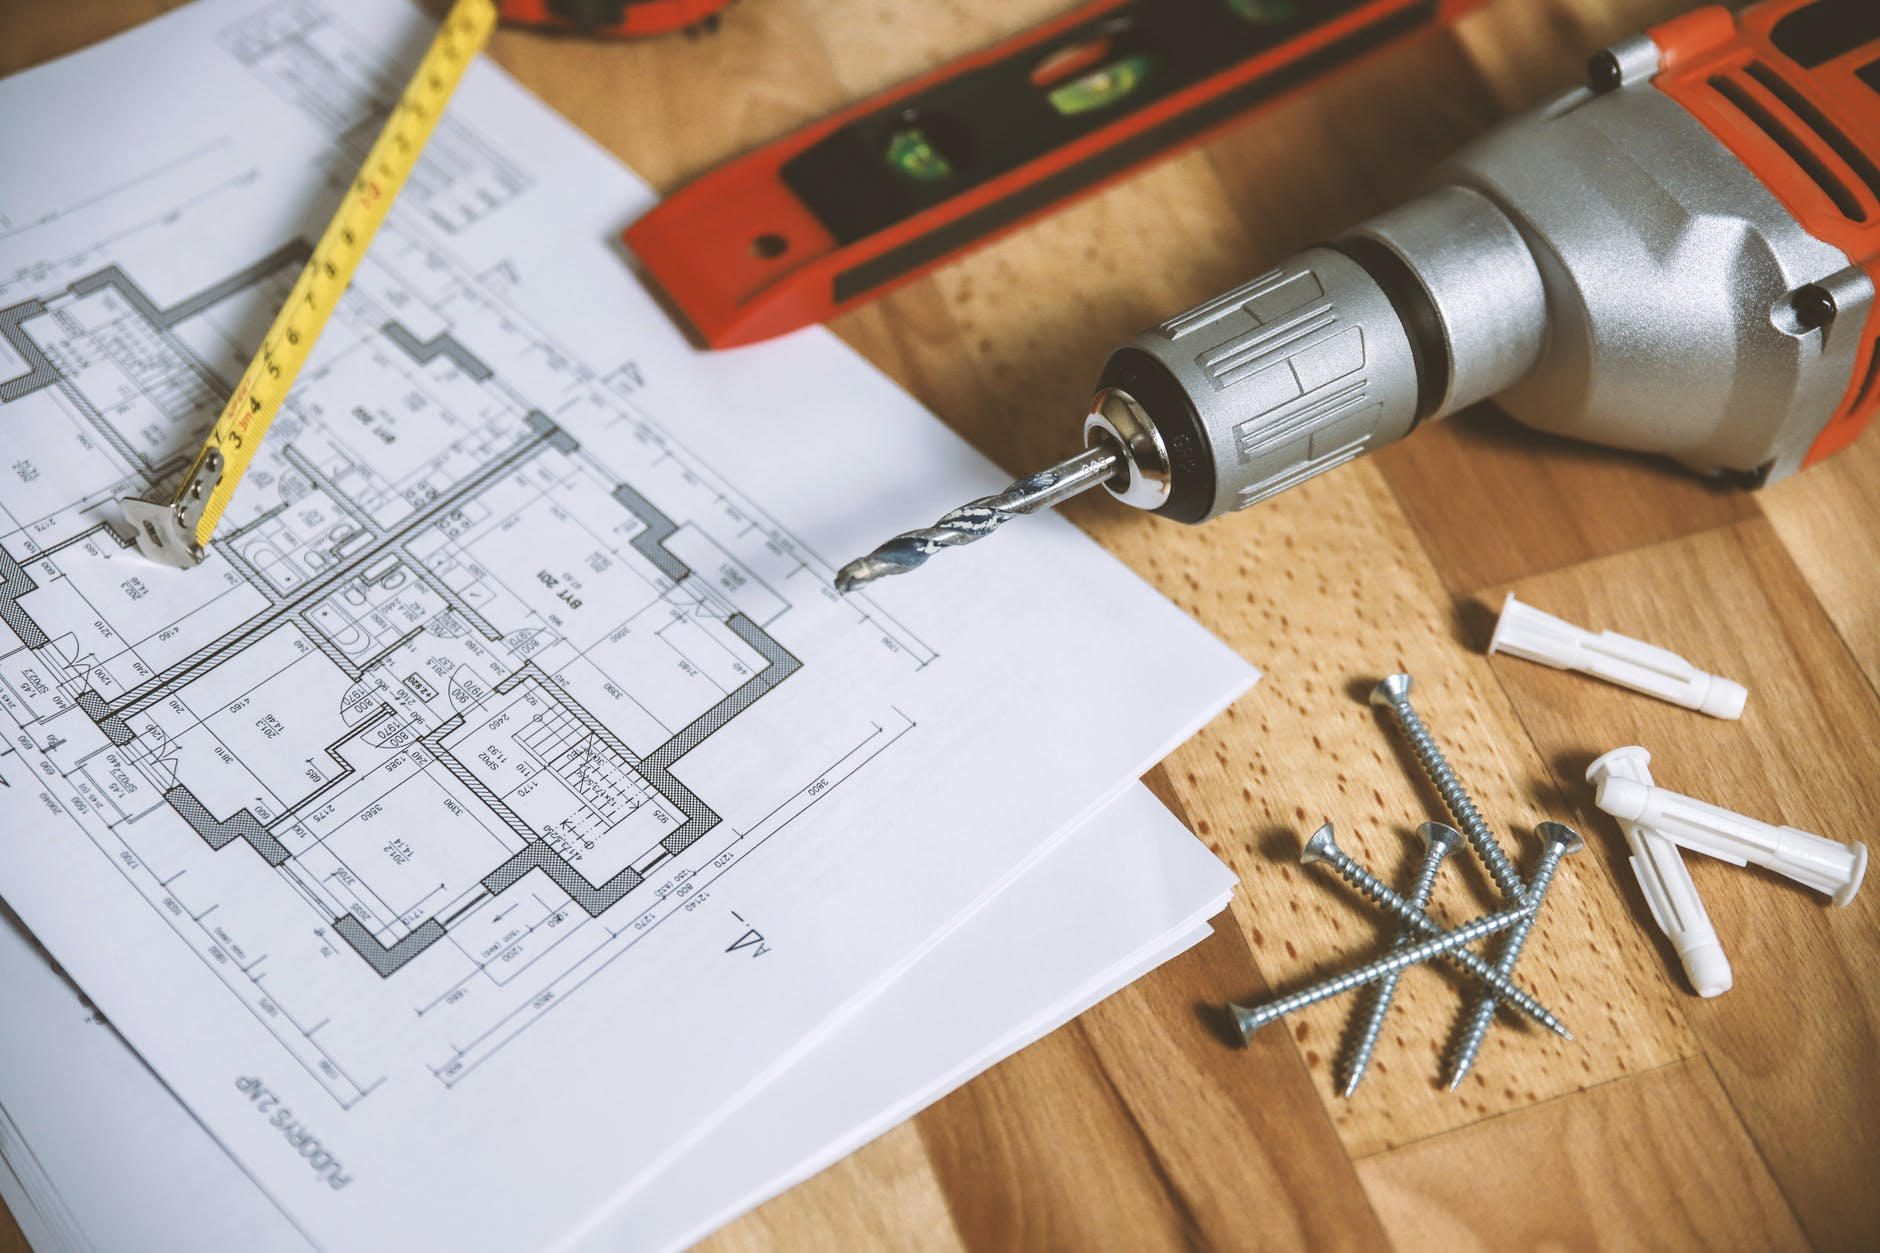 floor plan on table